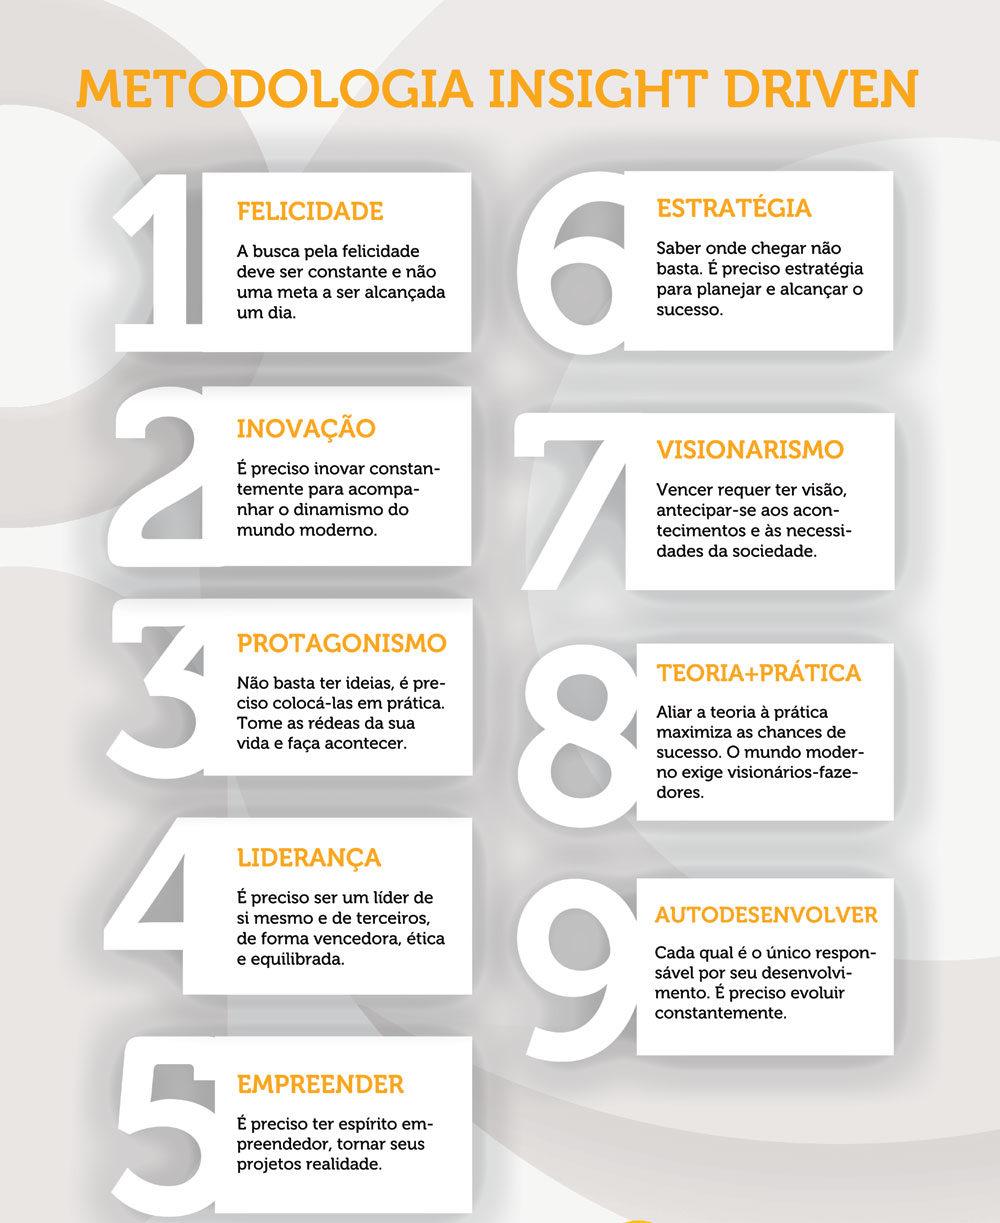 Banner-i9mentor-metodologia